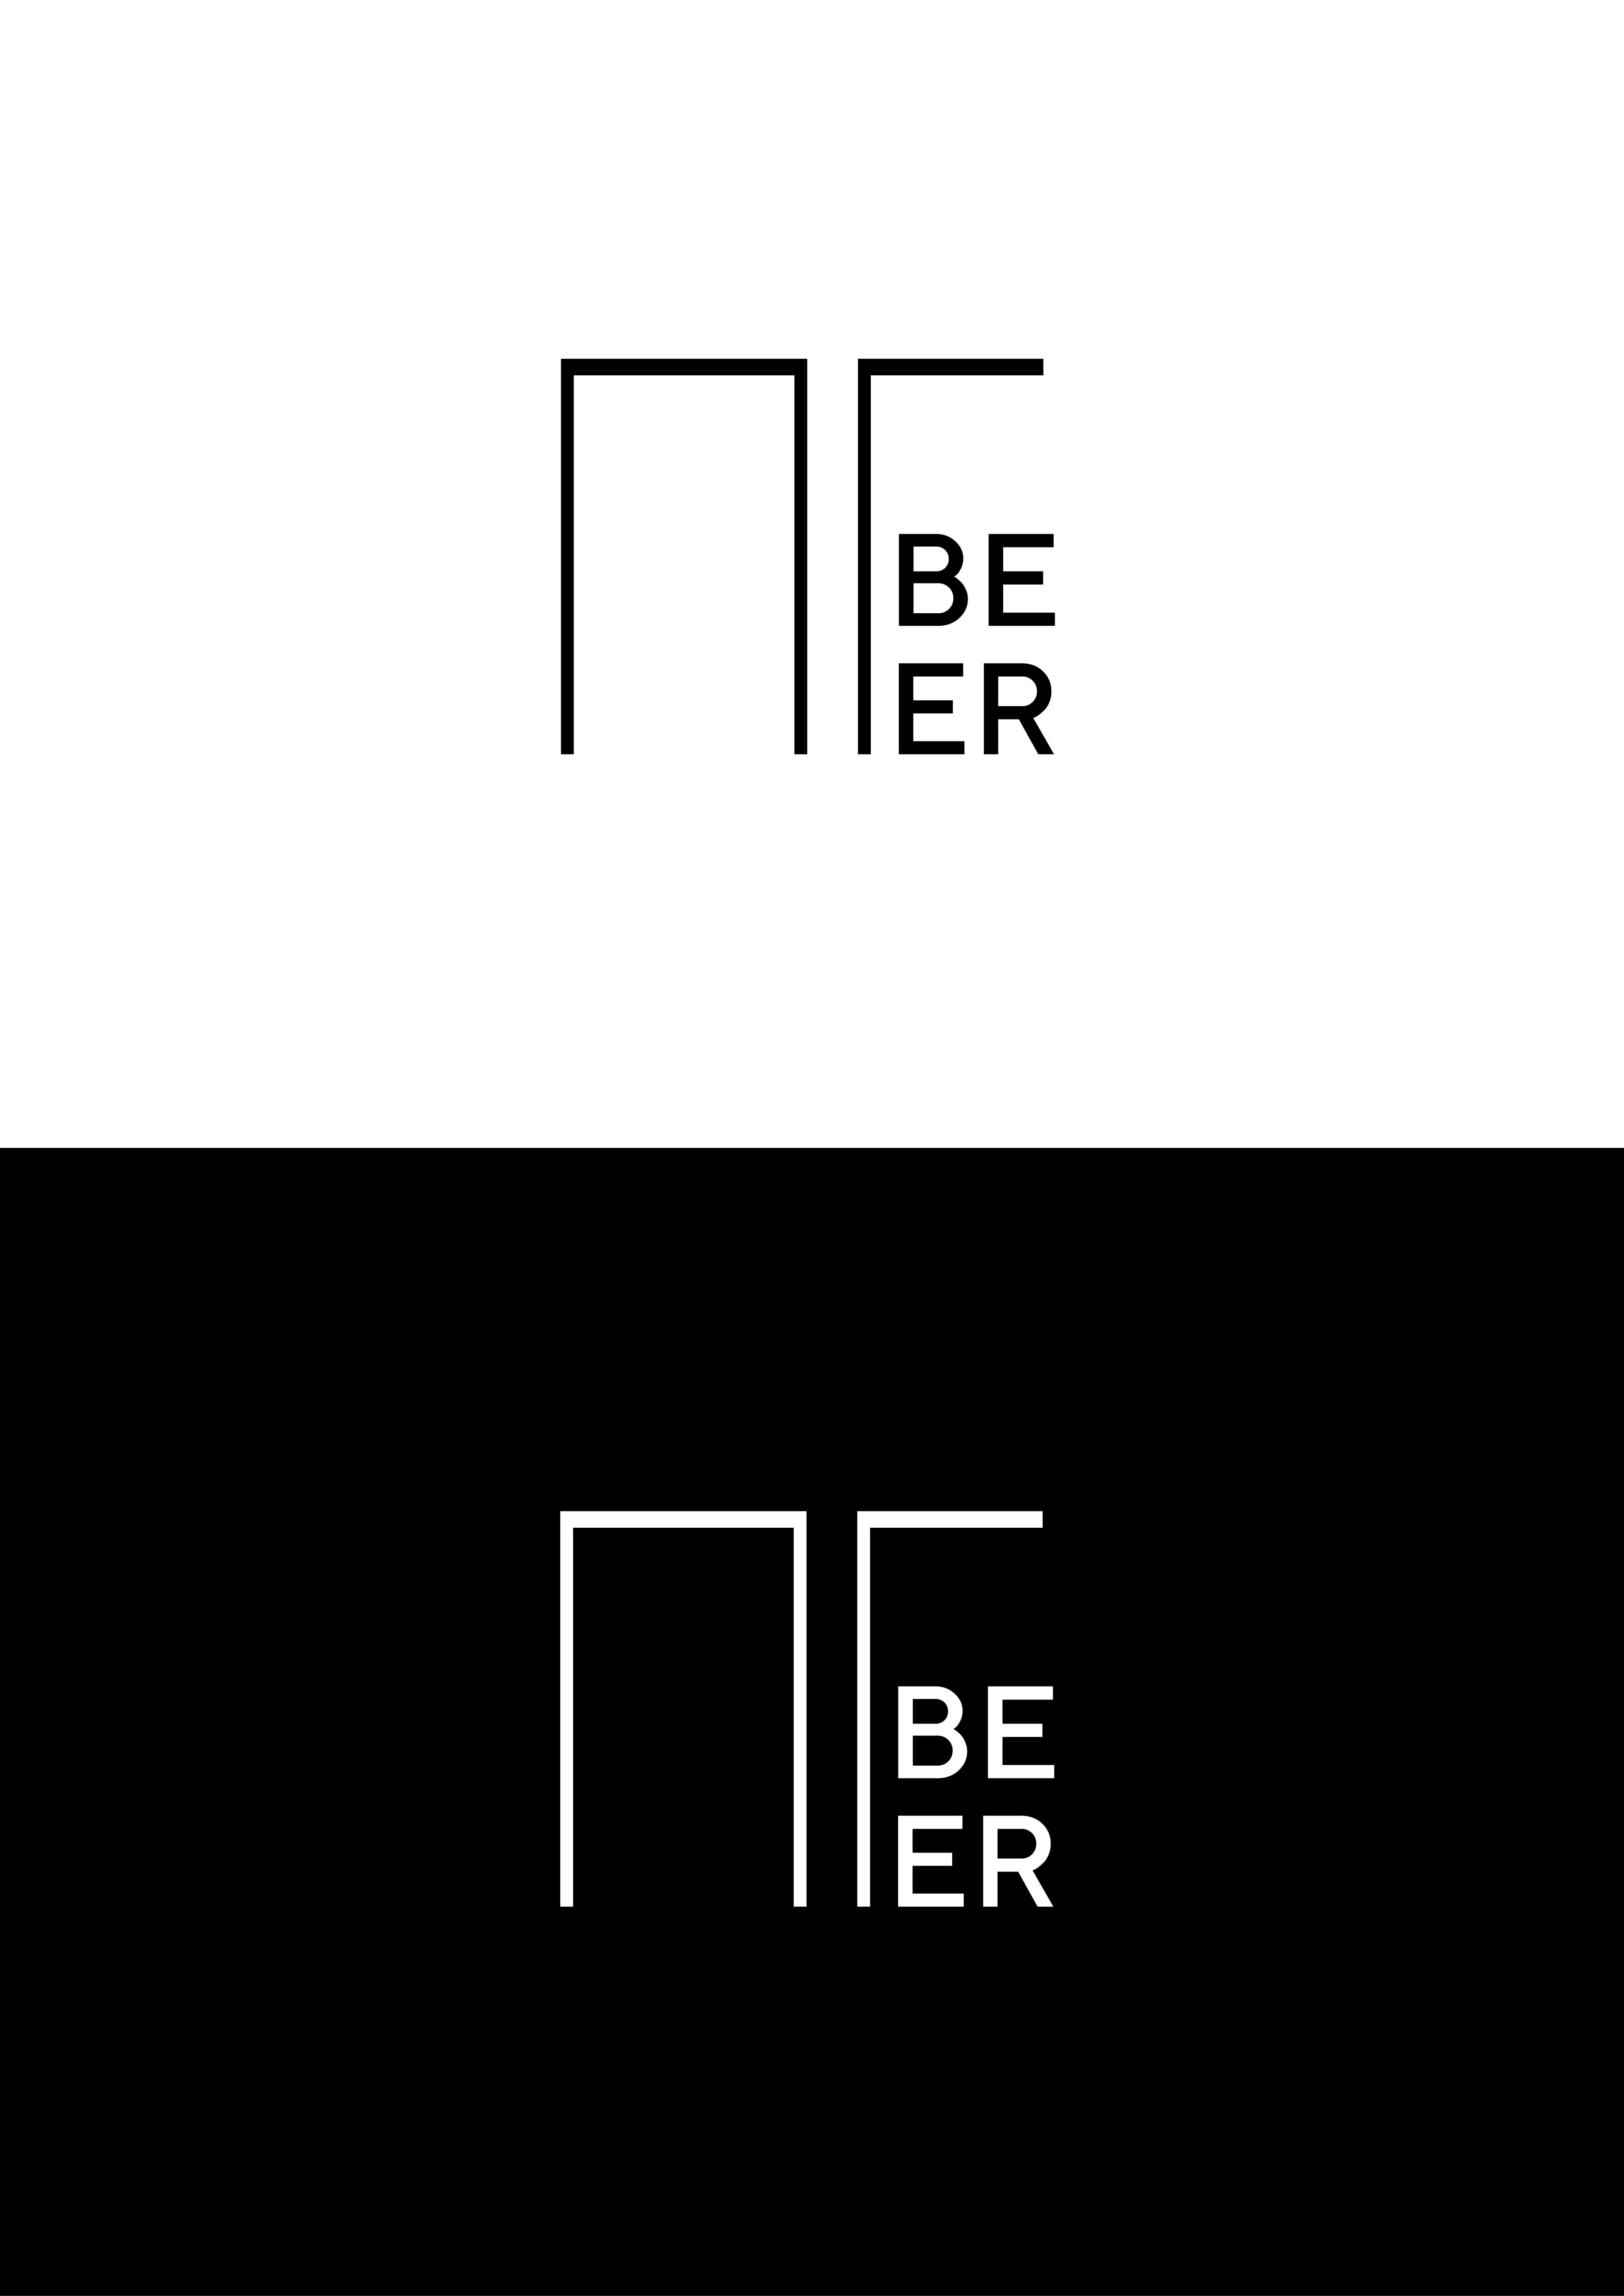 Логотип для Крафтовой Пивоварни фото f_8925cb4af8135ae6.jpg